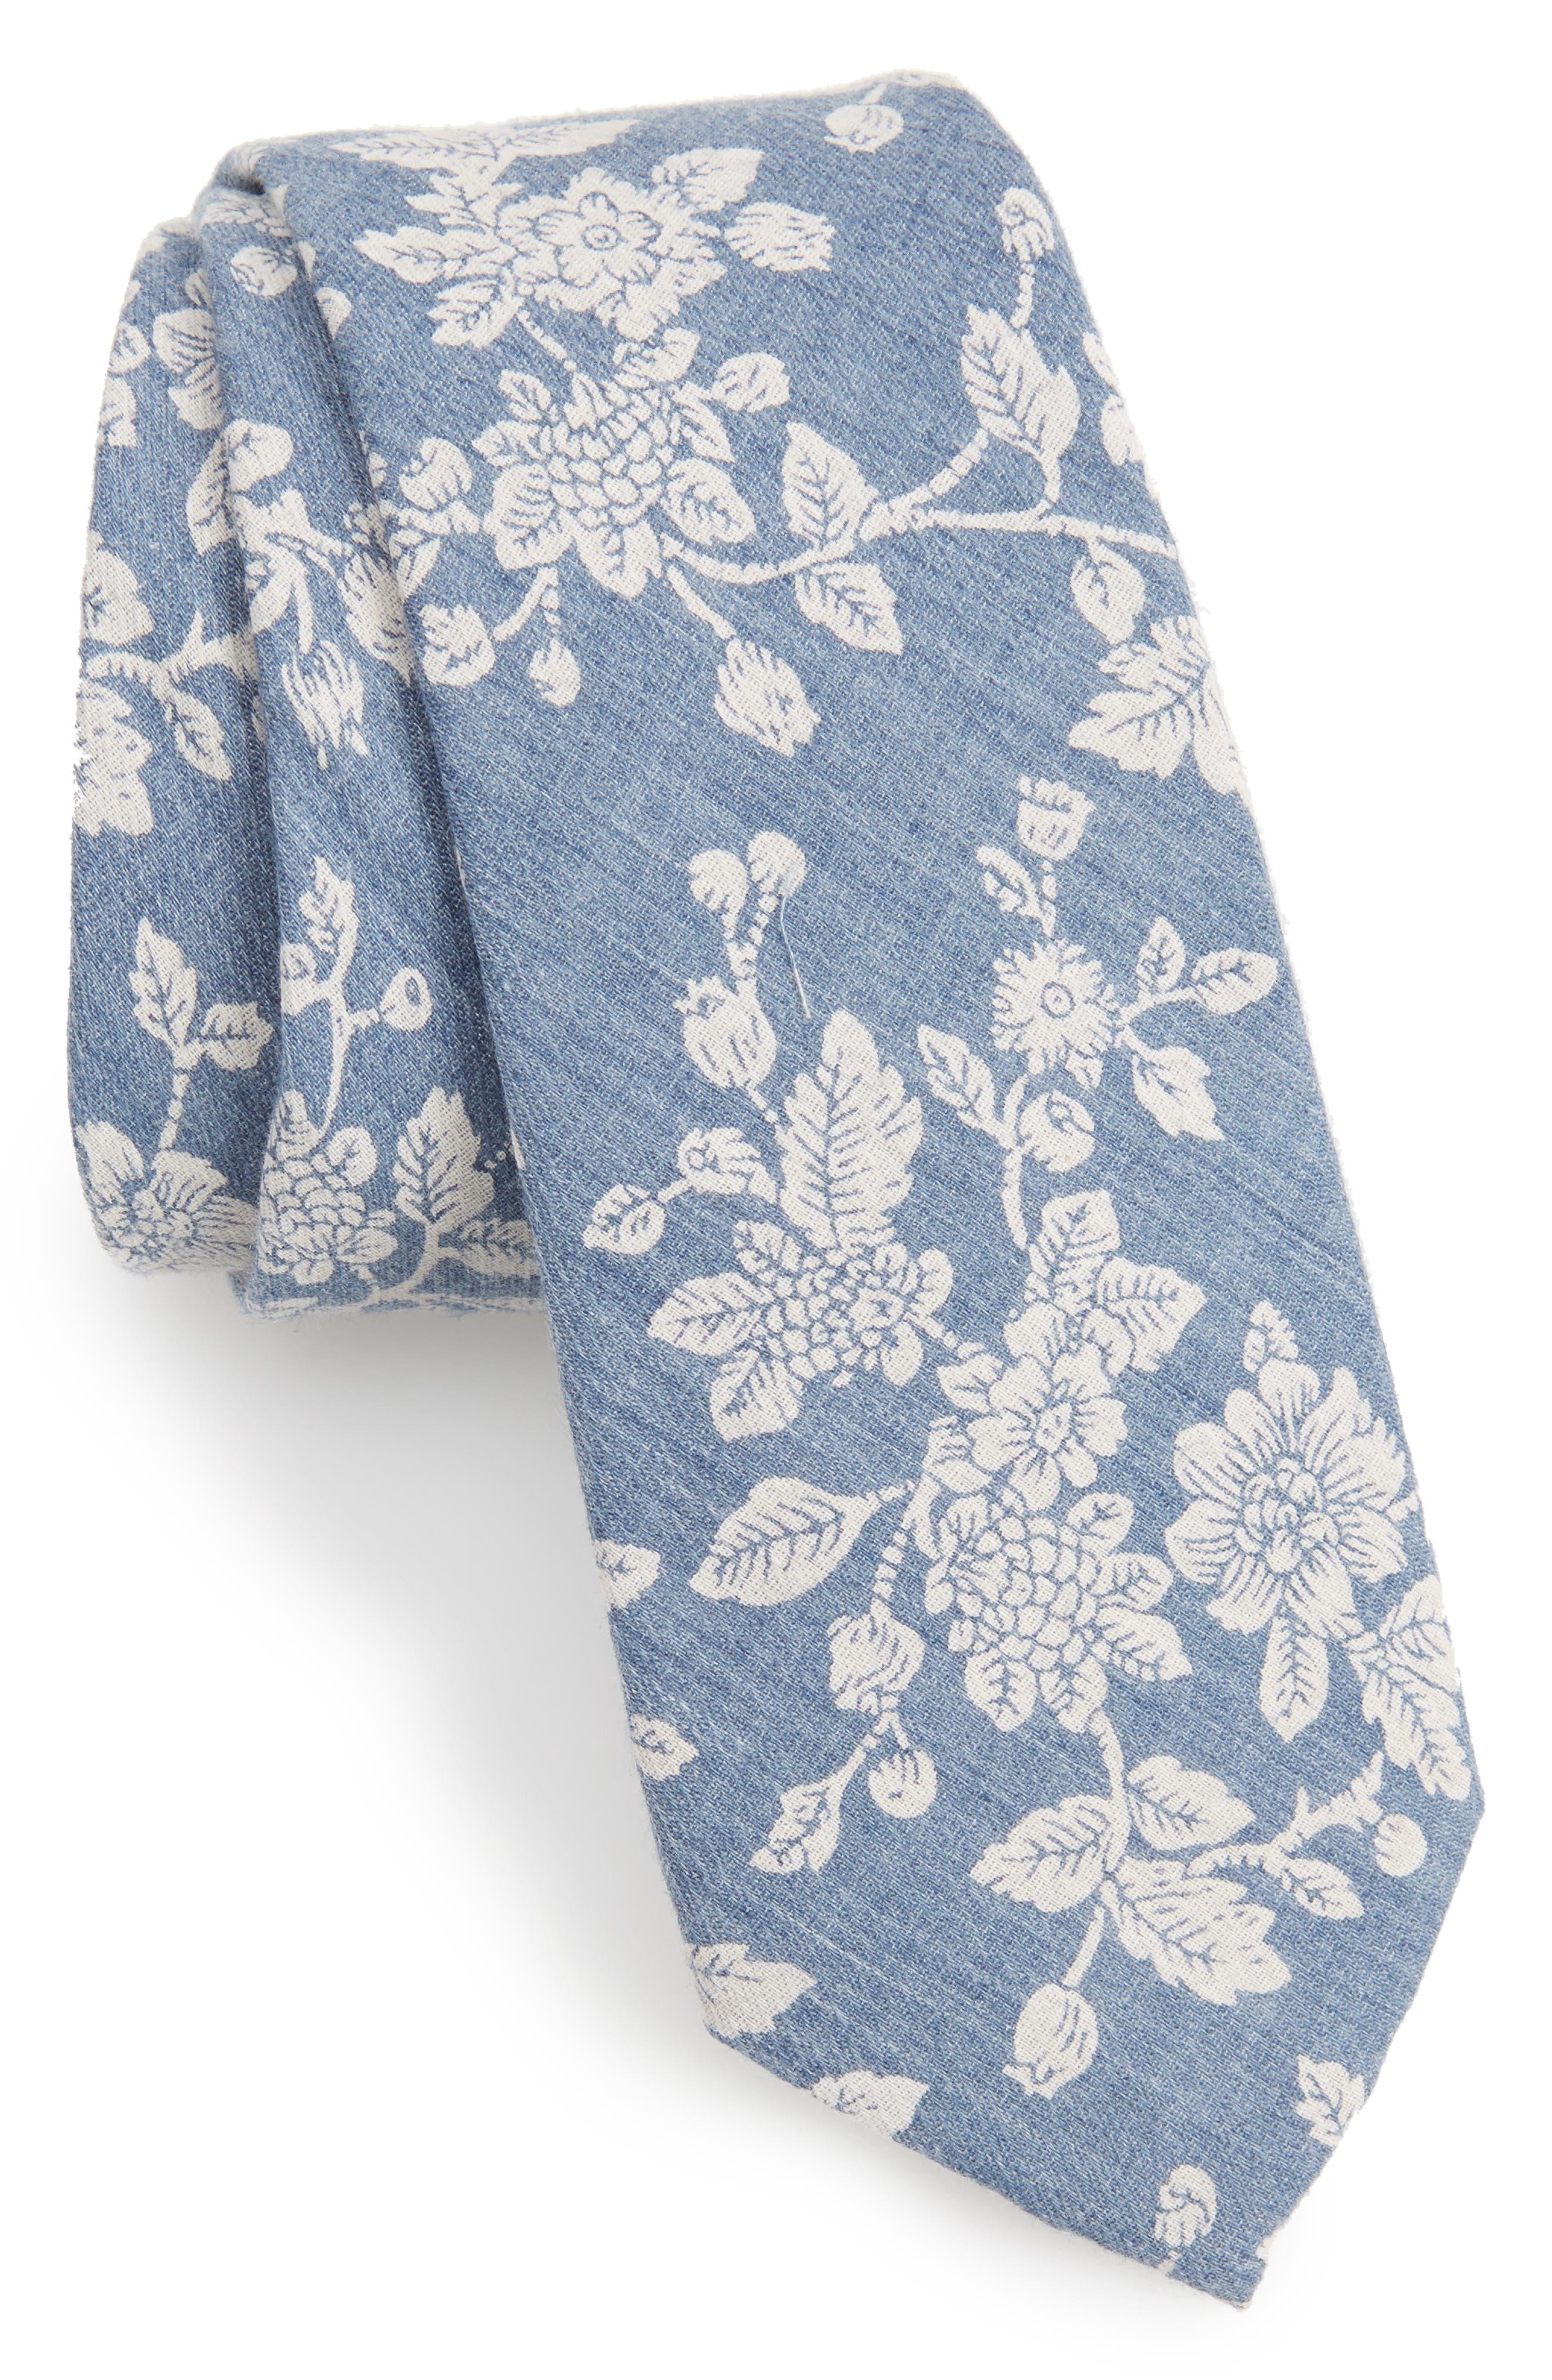 Floral Cotton Skinny Tie,                             Main thumbnail 1, color,                             Blue1